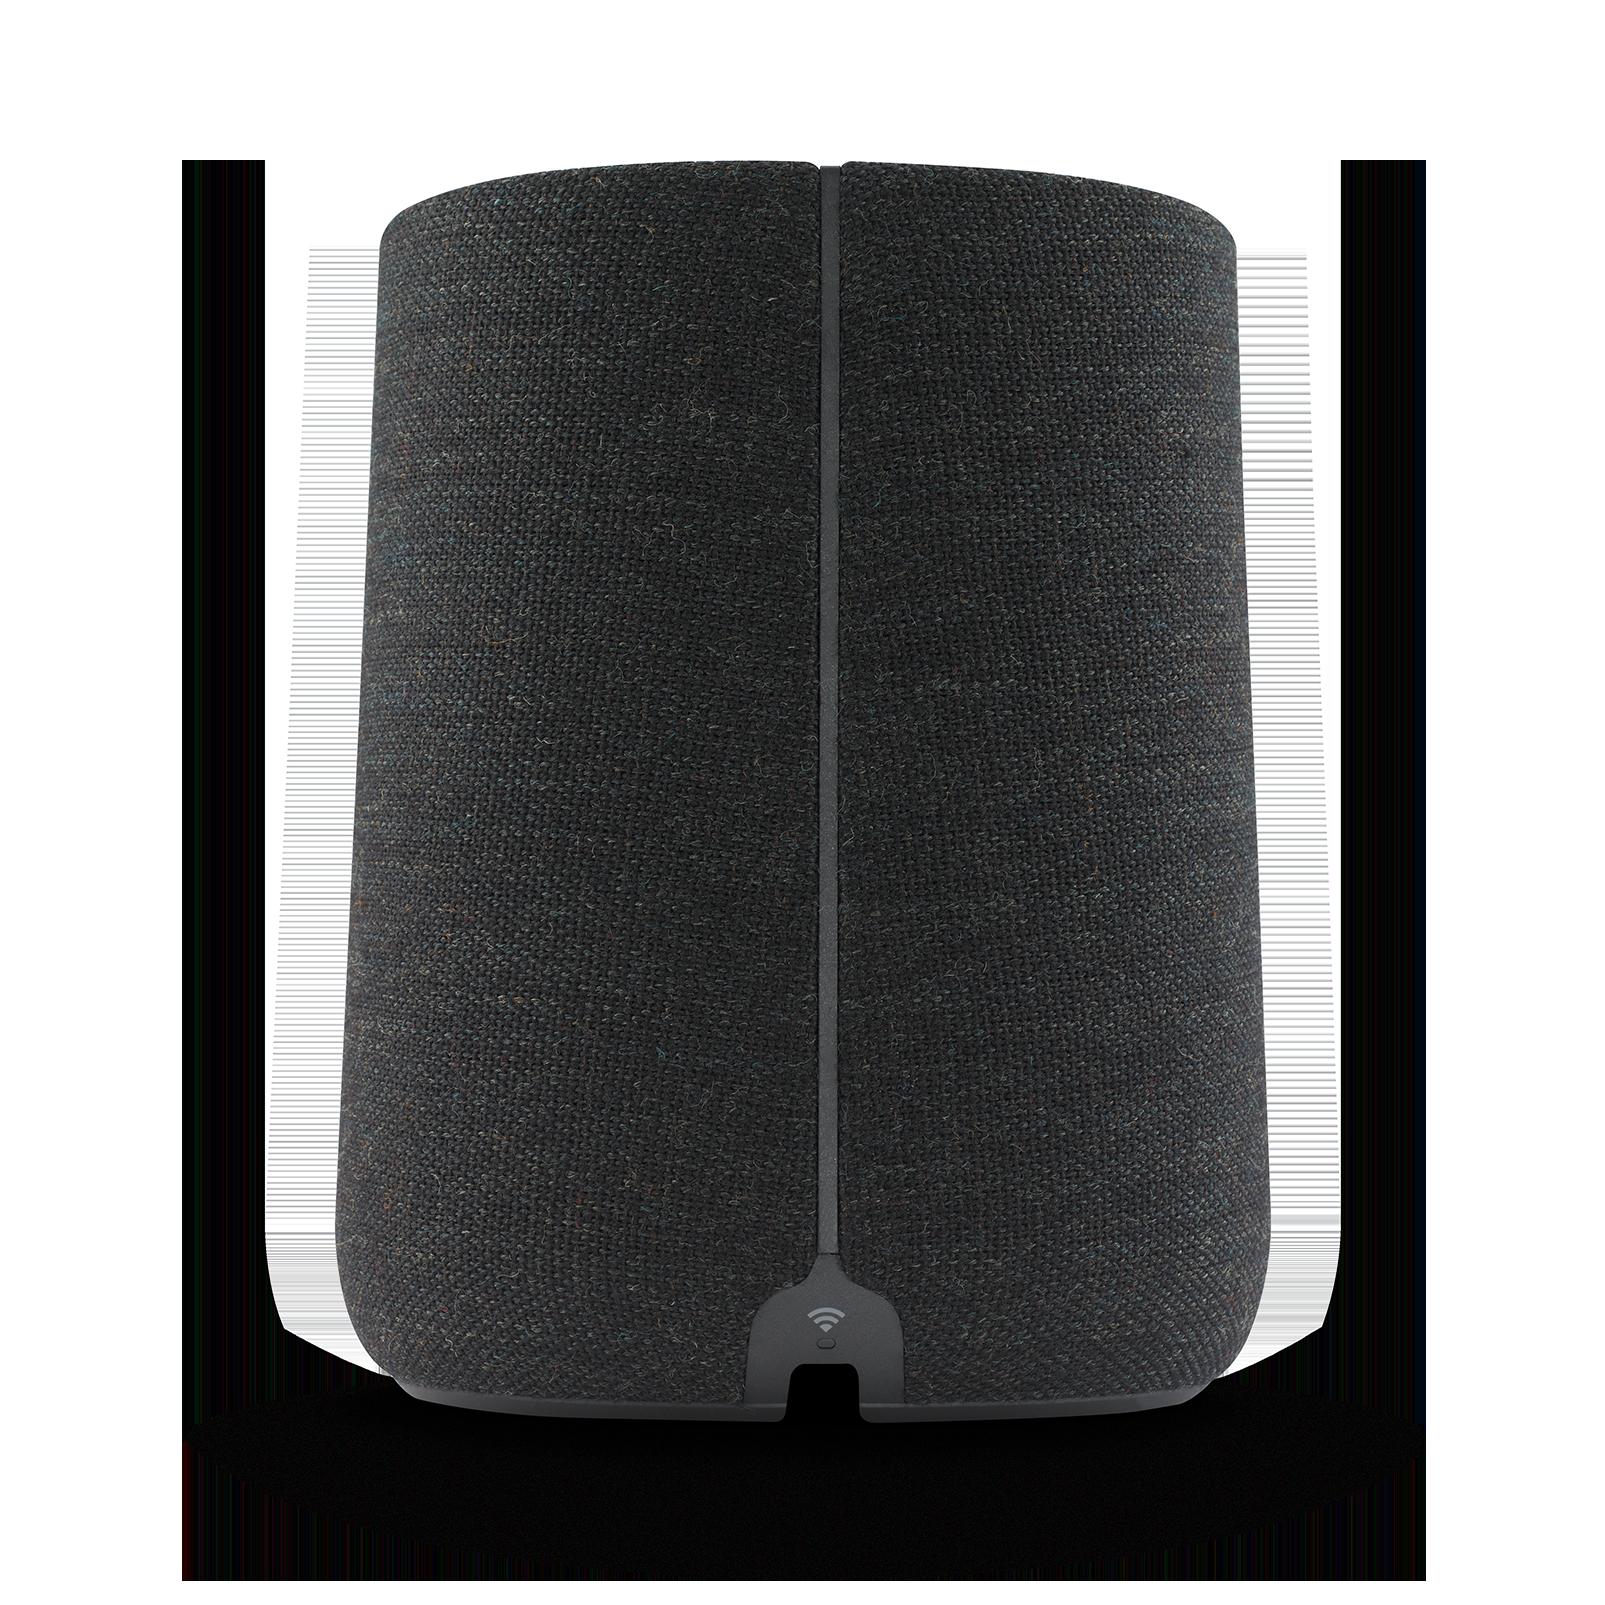 Harman Kardon Citation ONE DUO - Black - Compact, smart and amazing sound - Back